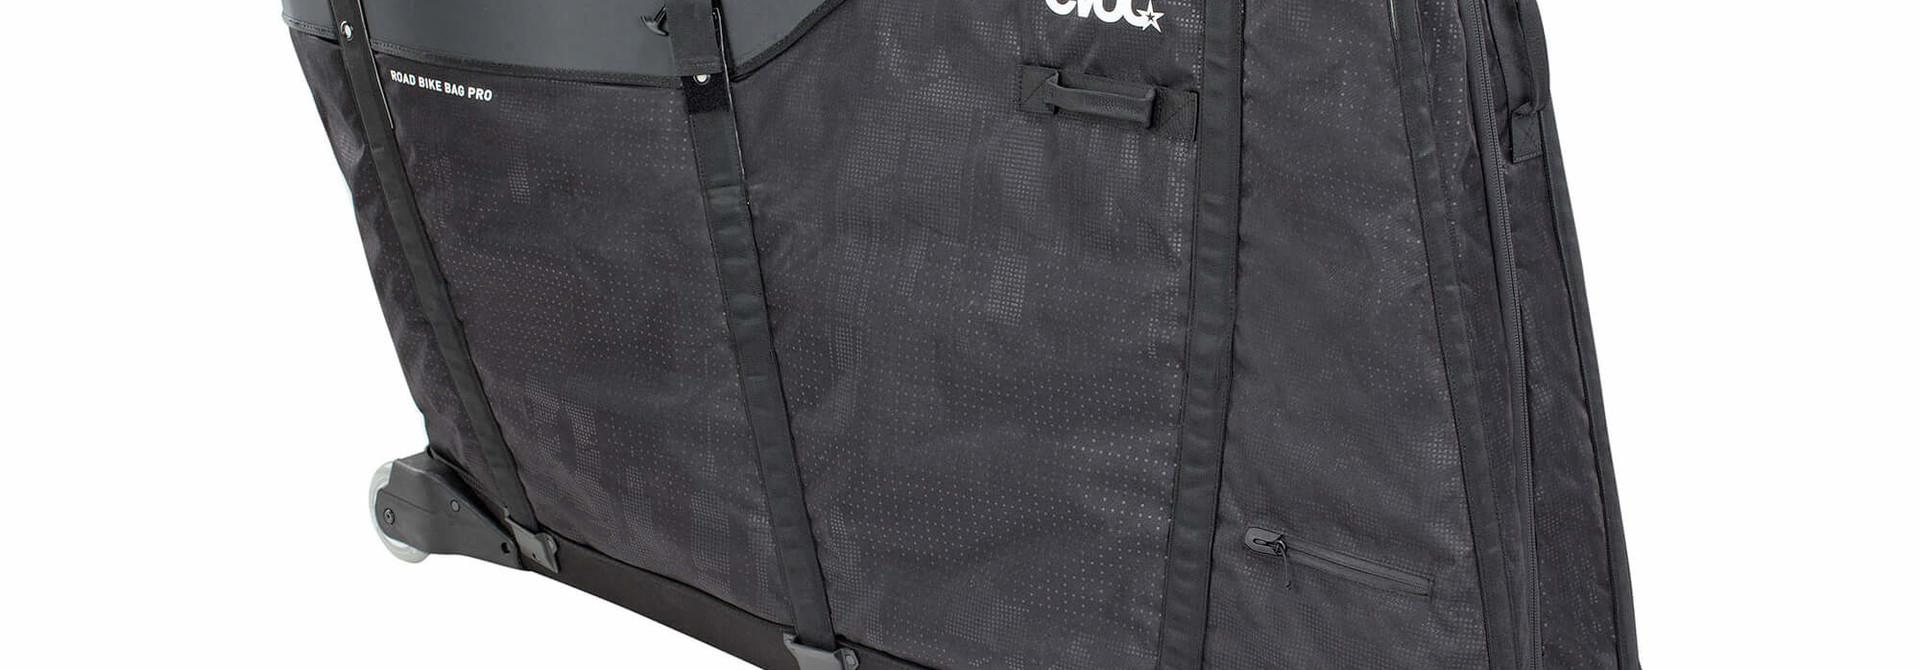 Road Bike Bag Pro Black